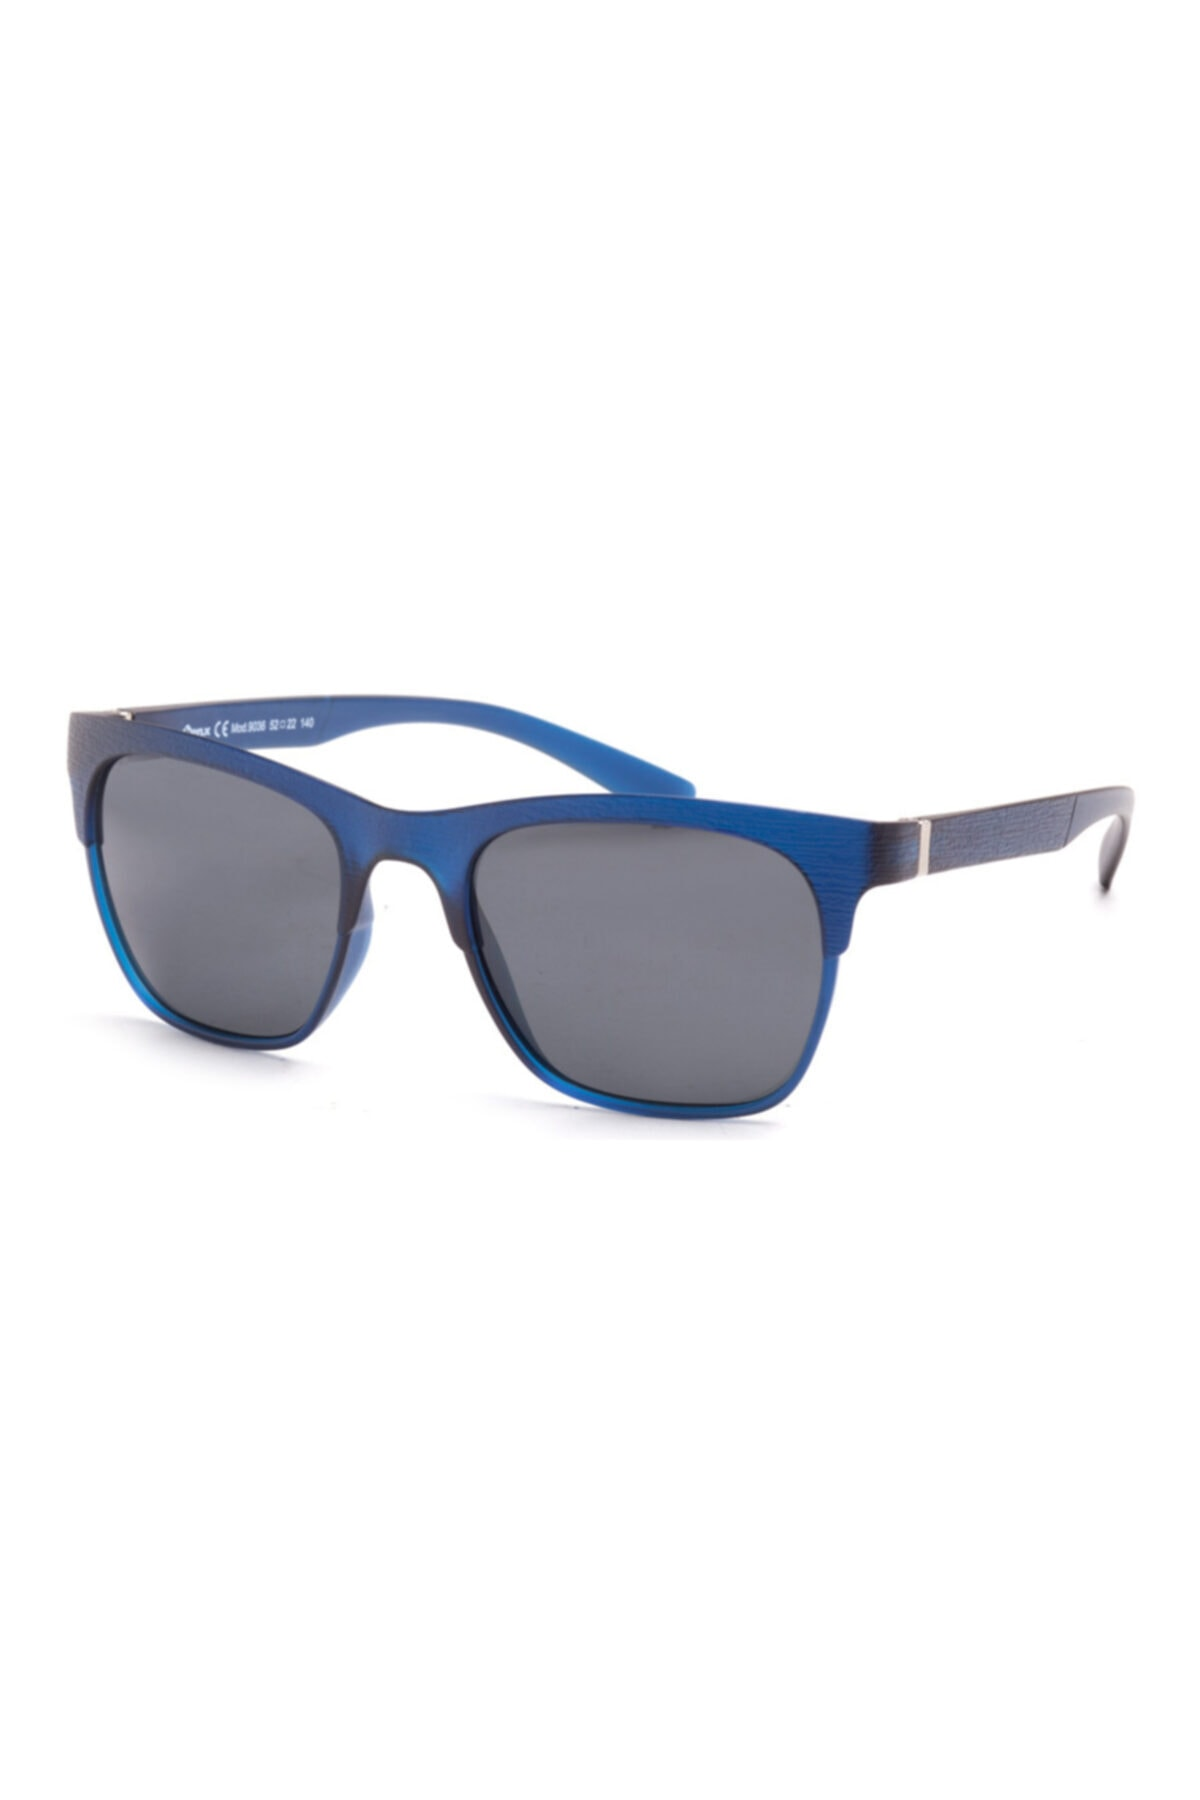 عینک آفتابی مردانه کوتاه برند BEN.X رنگ لاجوردی کد ty85956408